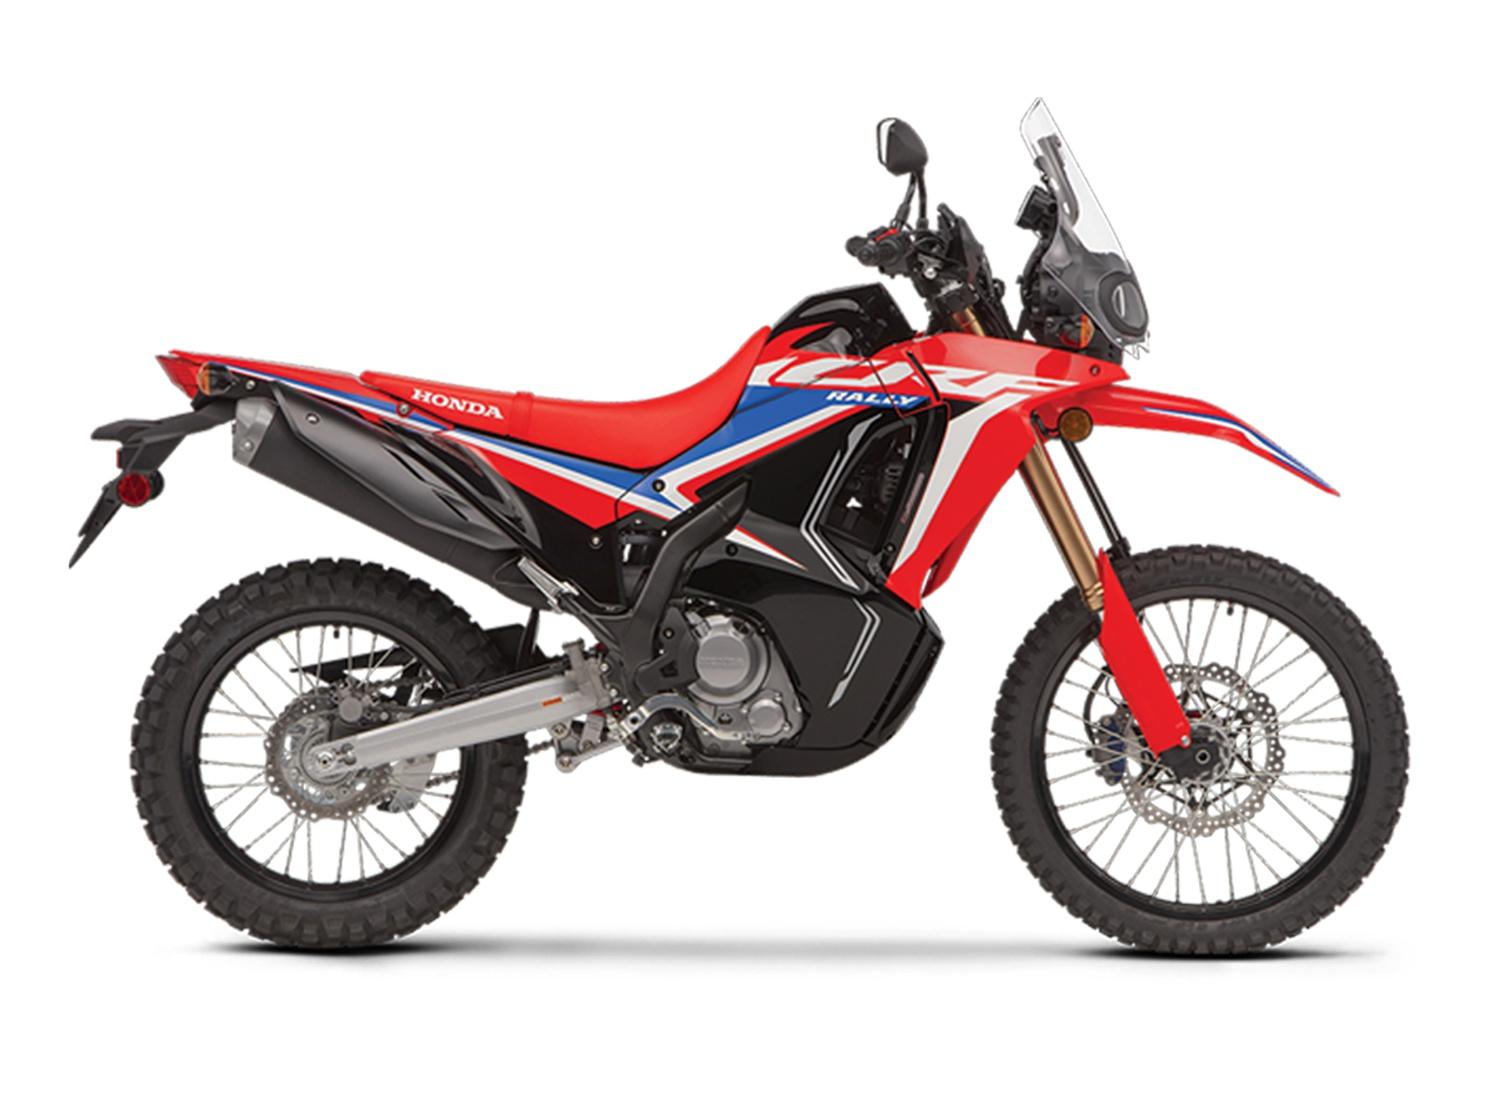 2021 Honda CRF300L Rally ABS Frais inclus+Taxes